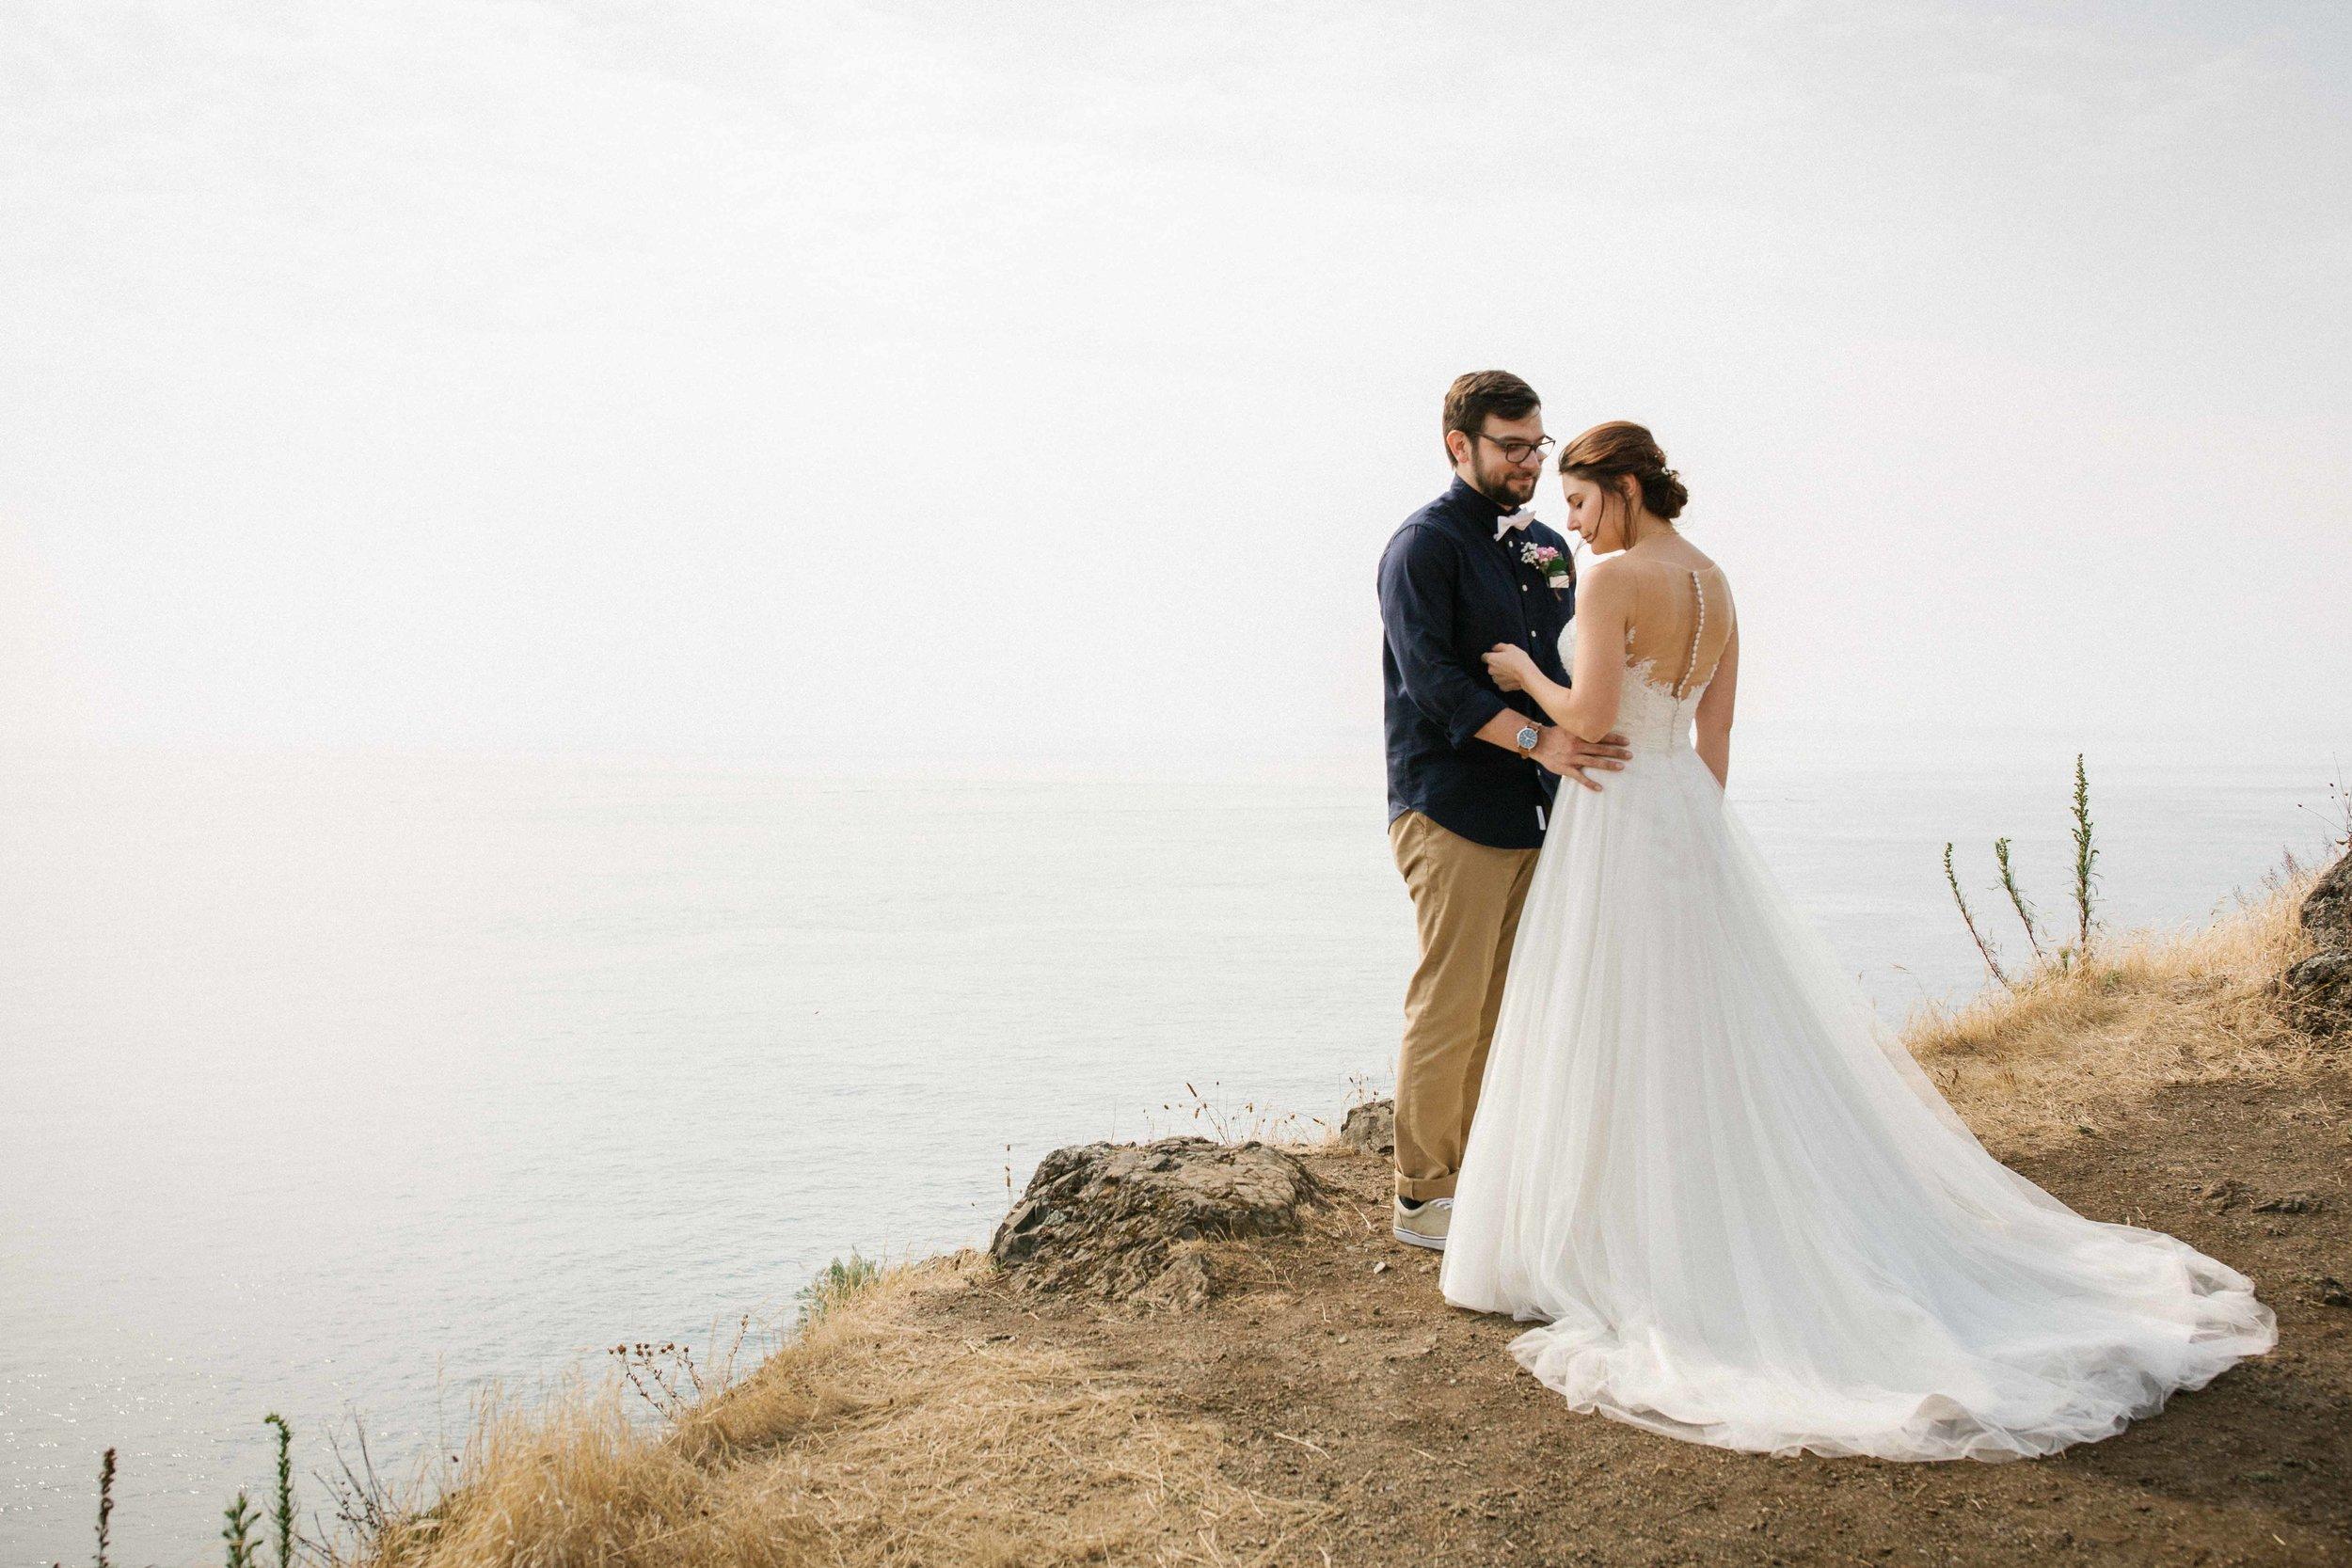 deception-pass-wedding-47.jpg